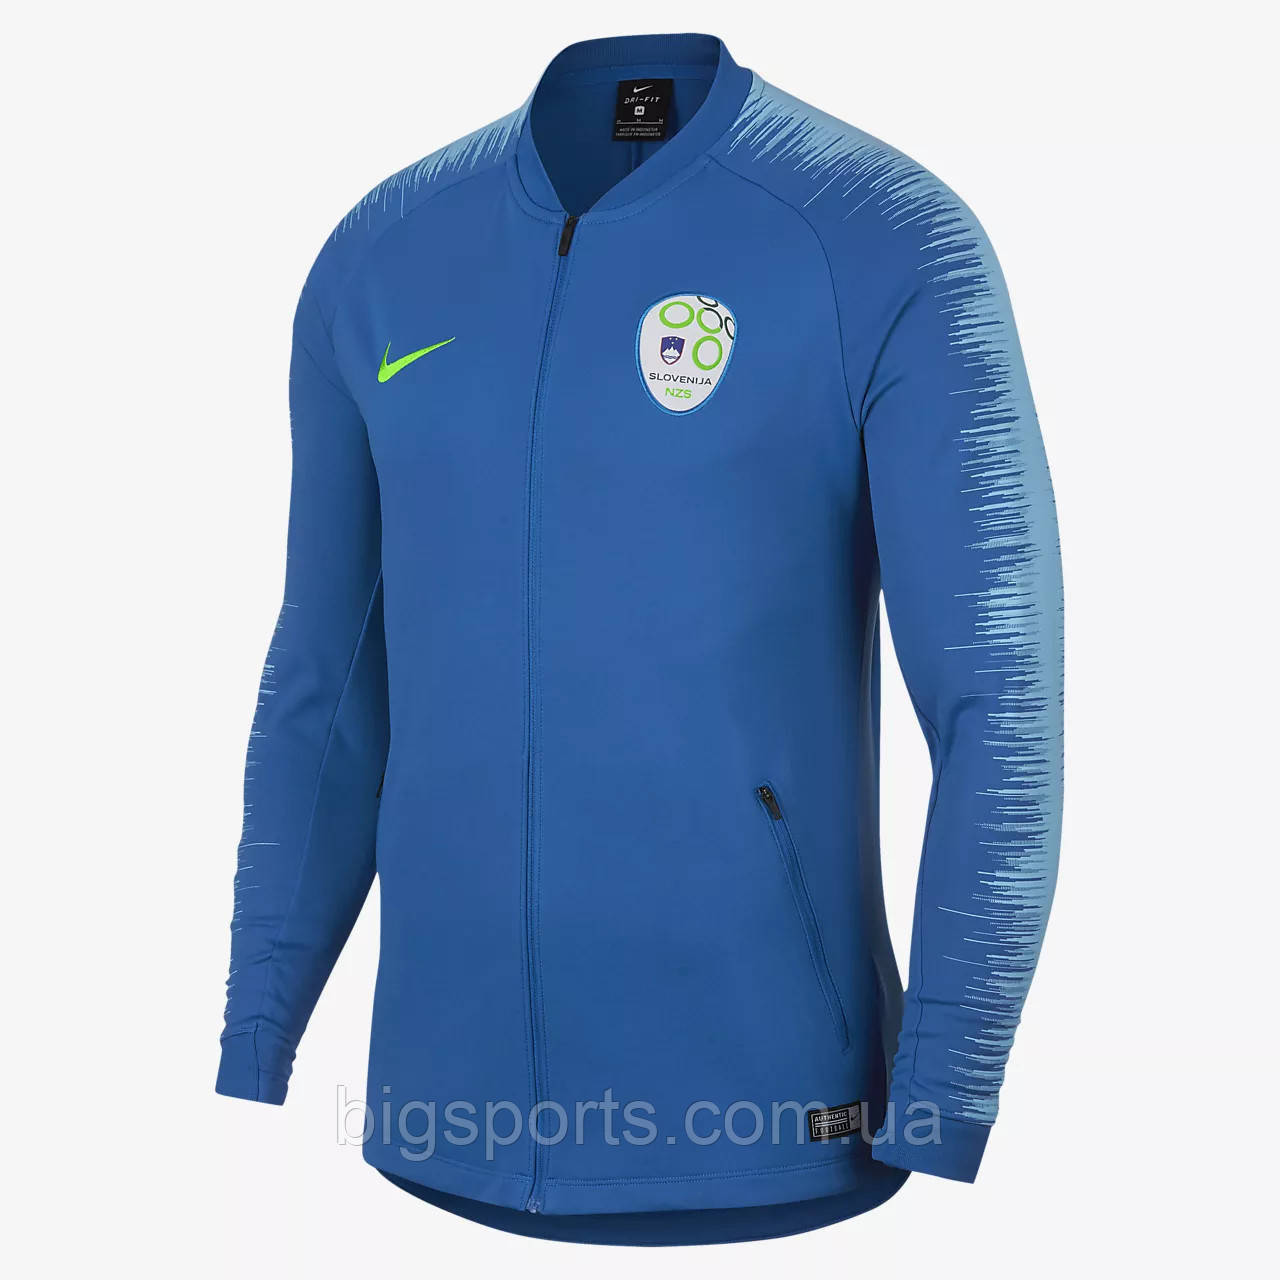 Ветровка муж. Nike Svn M Nk Anthm Fb Jkt (арт. 893604-465)